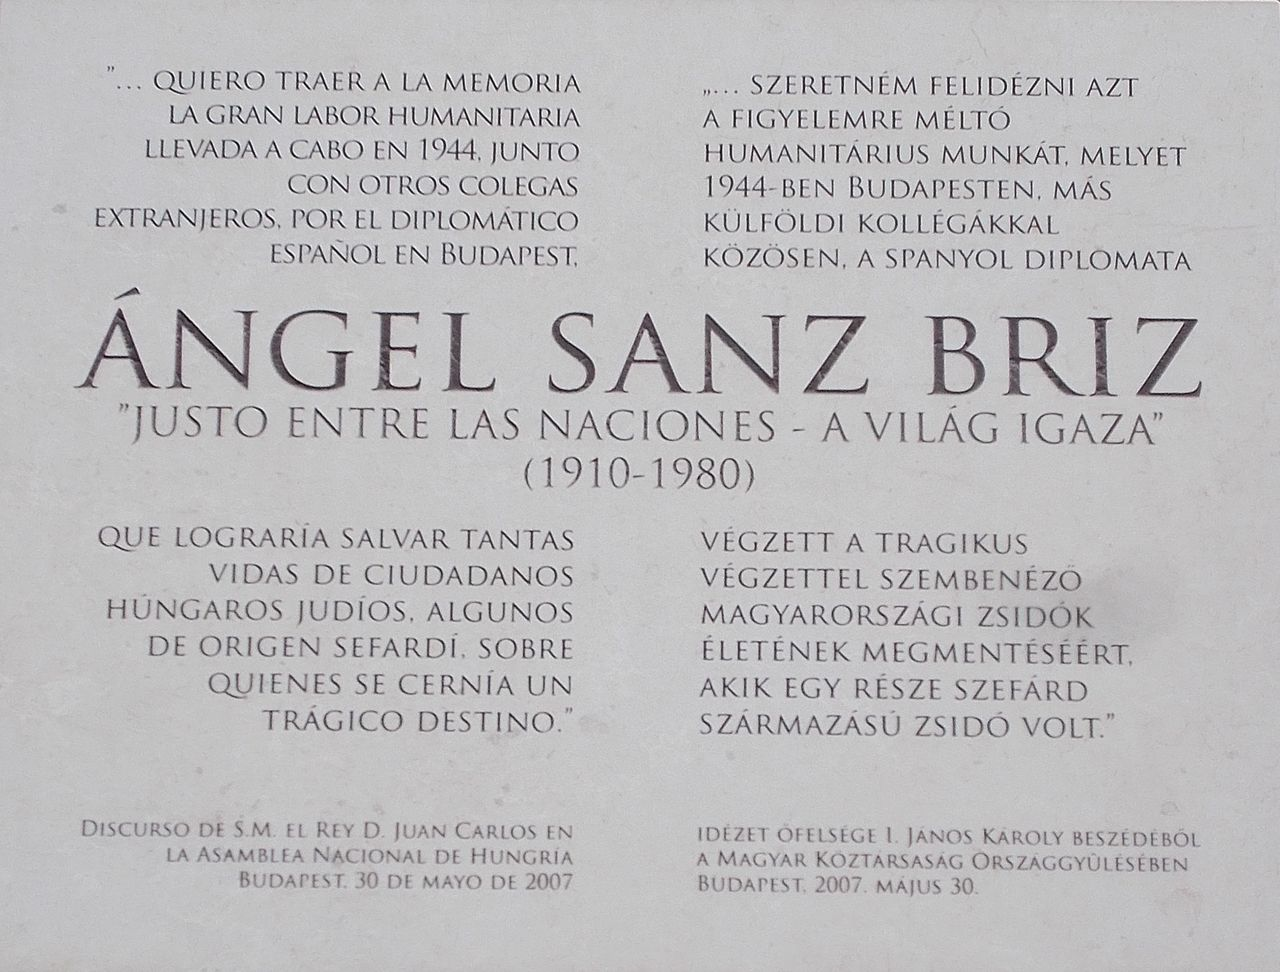 File:Plaque of the Spanish diplomat Mr  Angel Sanz Briz